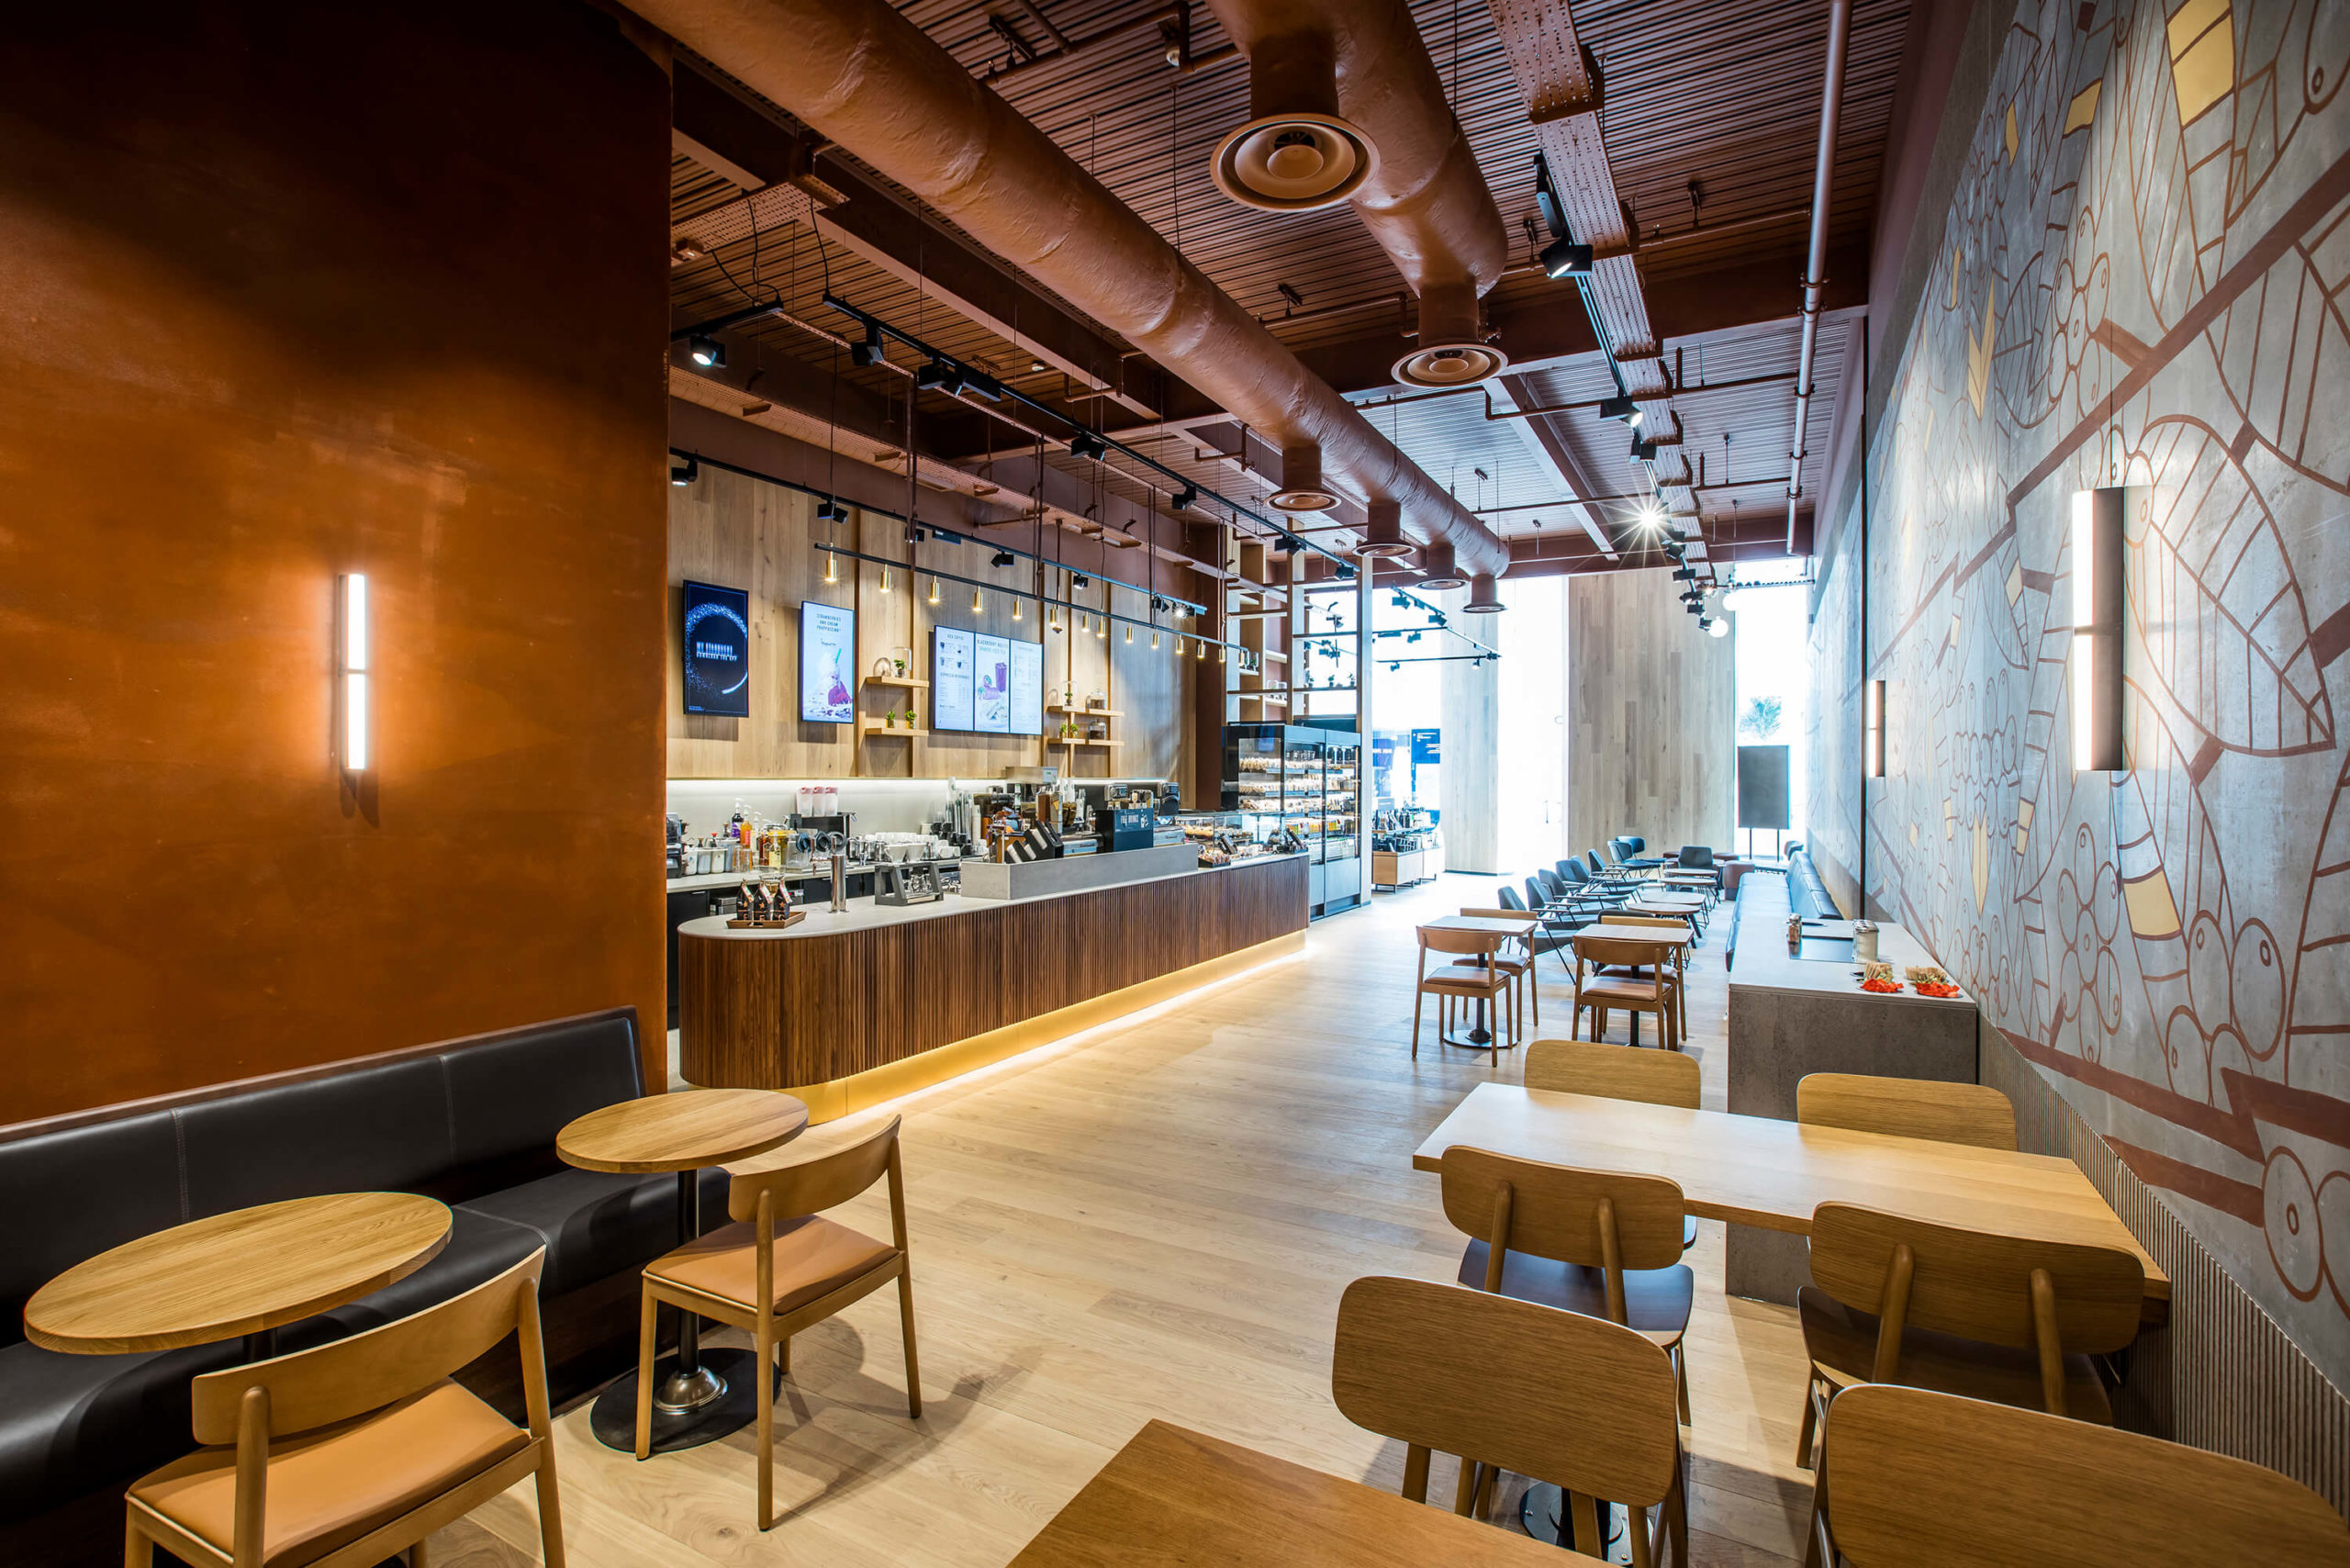 Starbucks, Westfield, Shepherds Bush